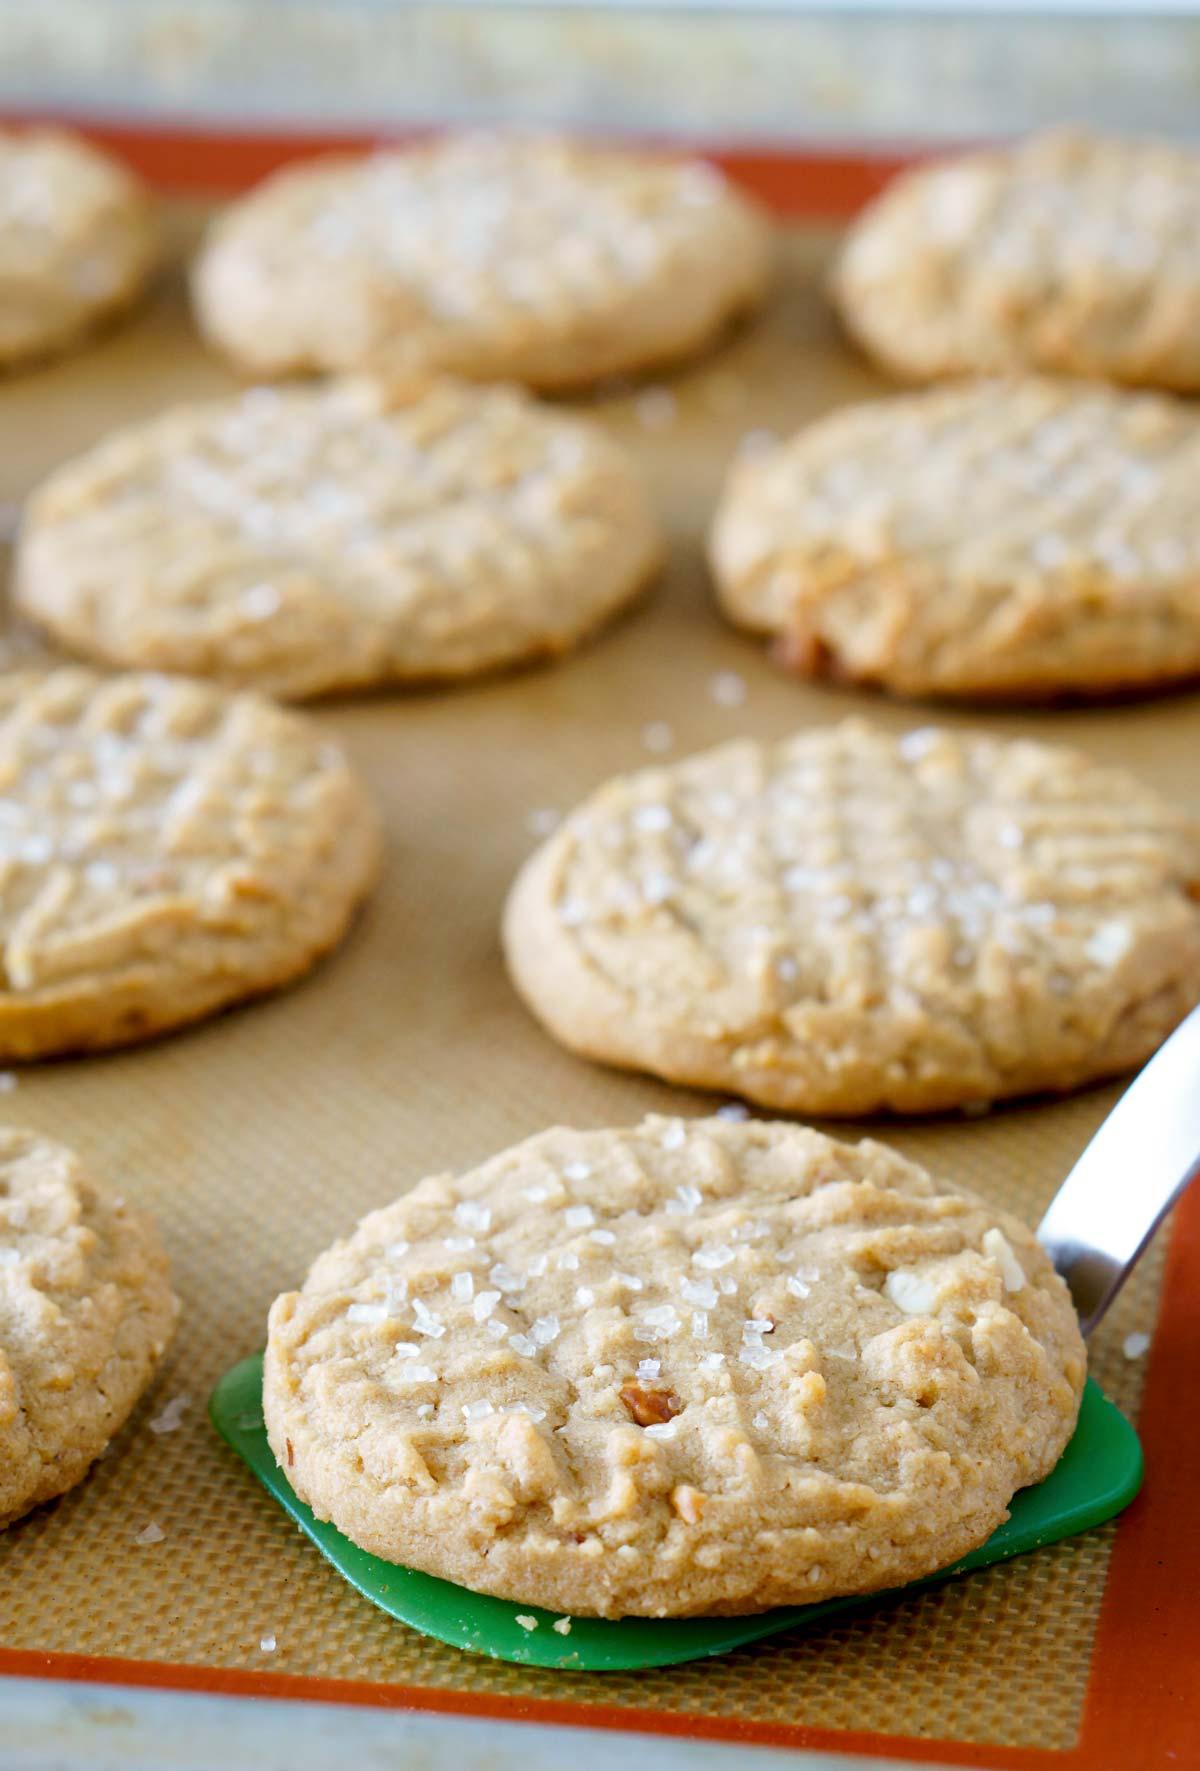 Crisscrossed Peanut Butter Cookies